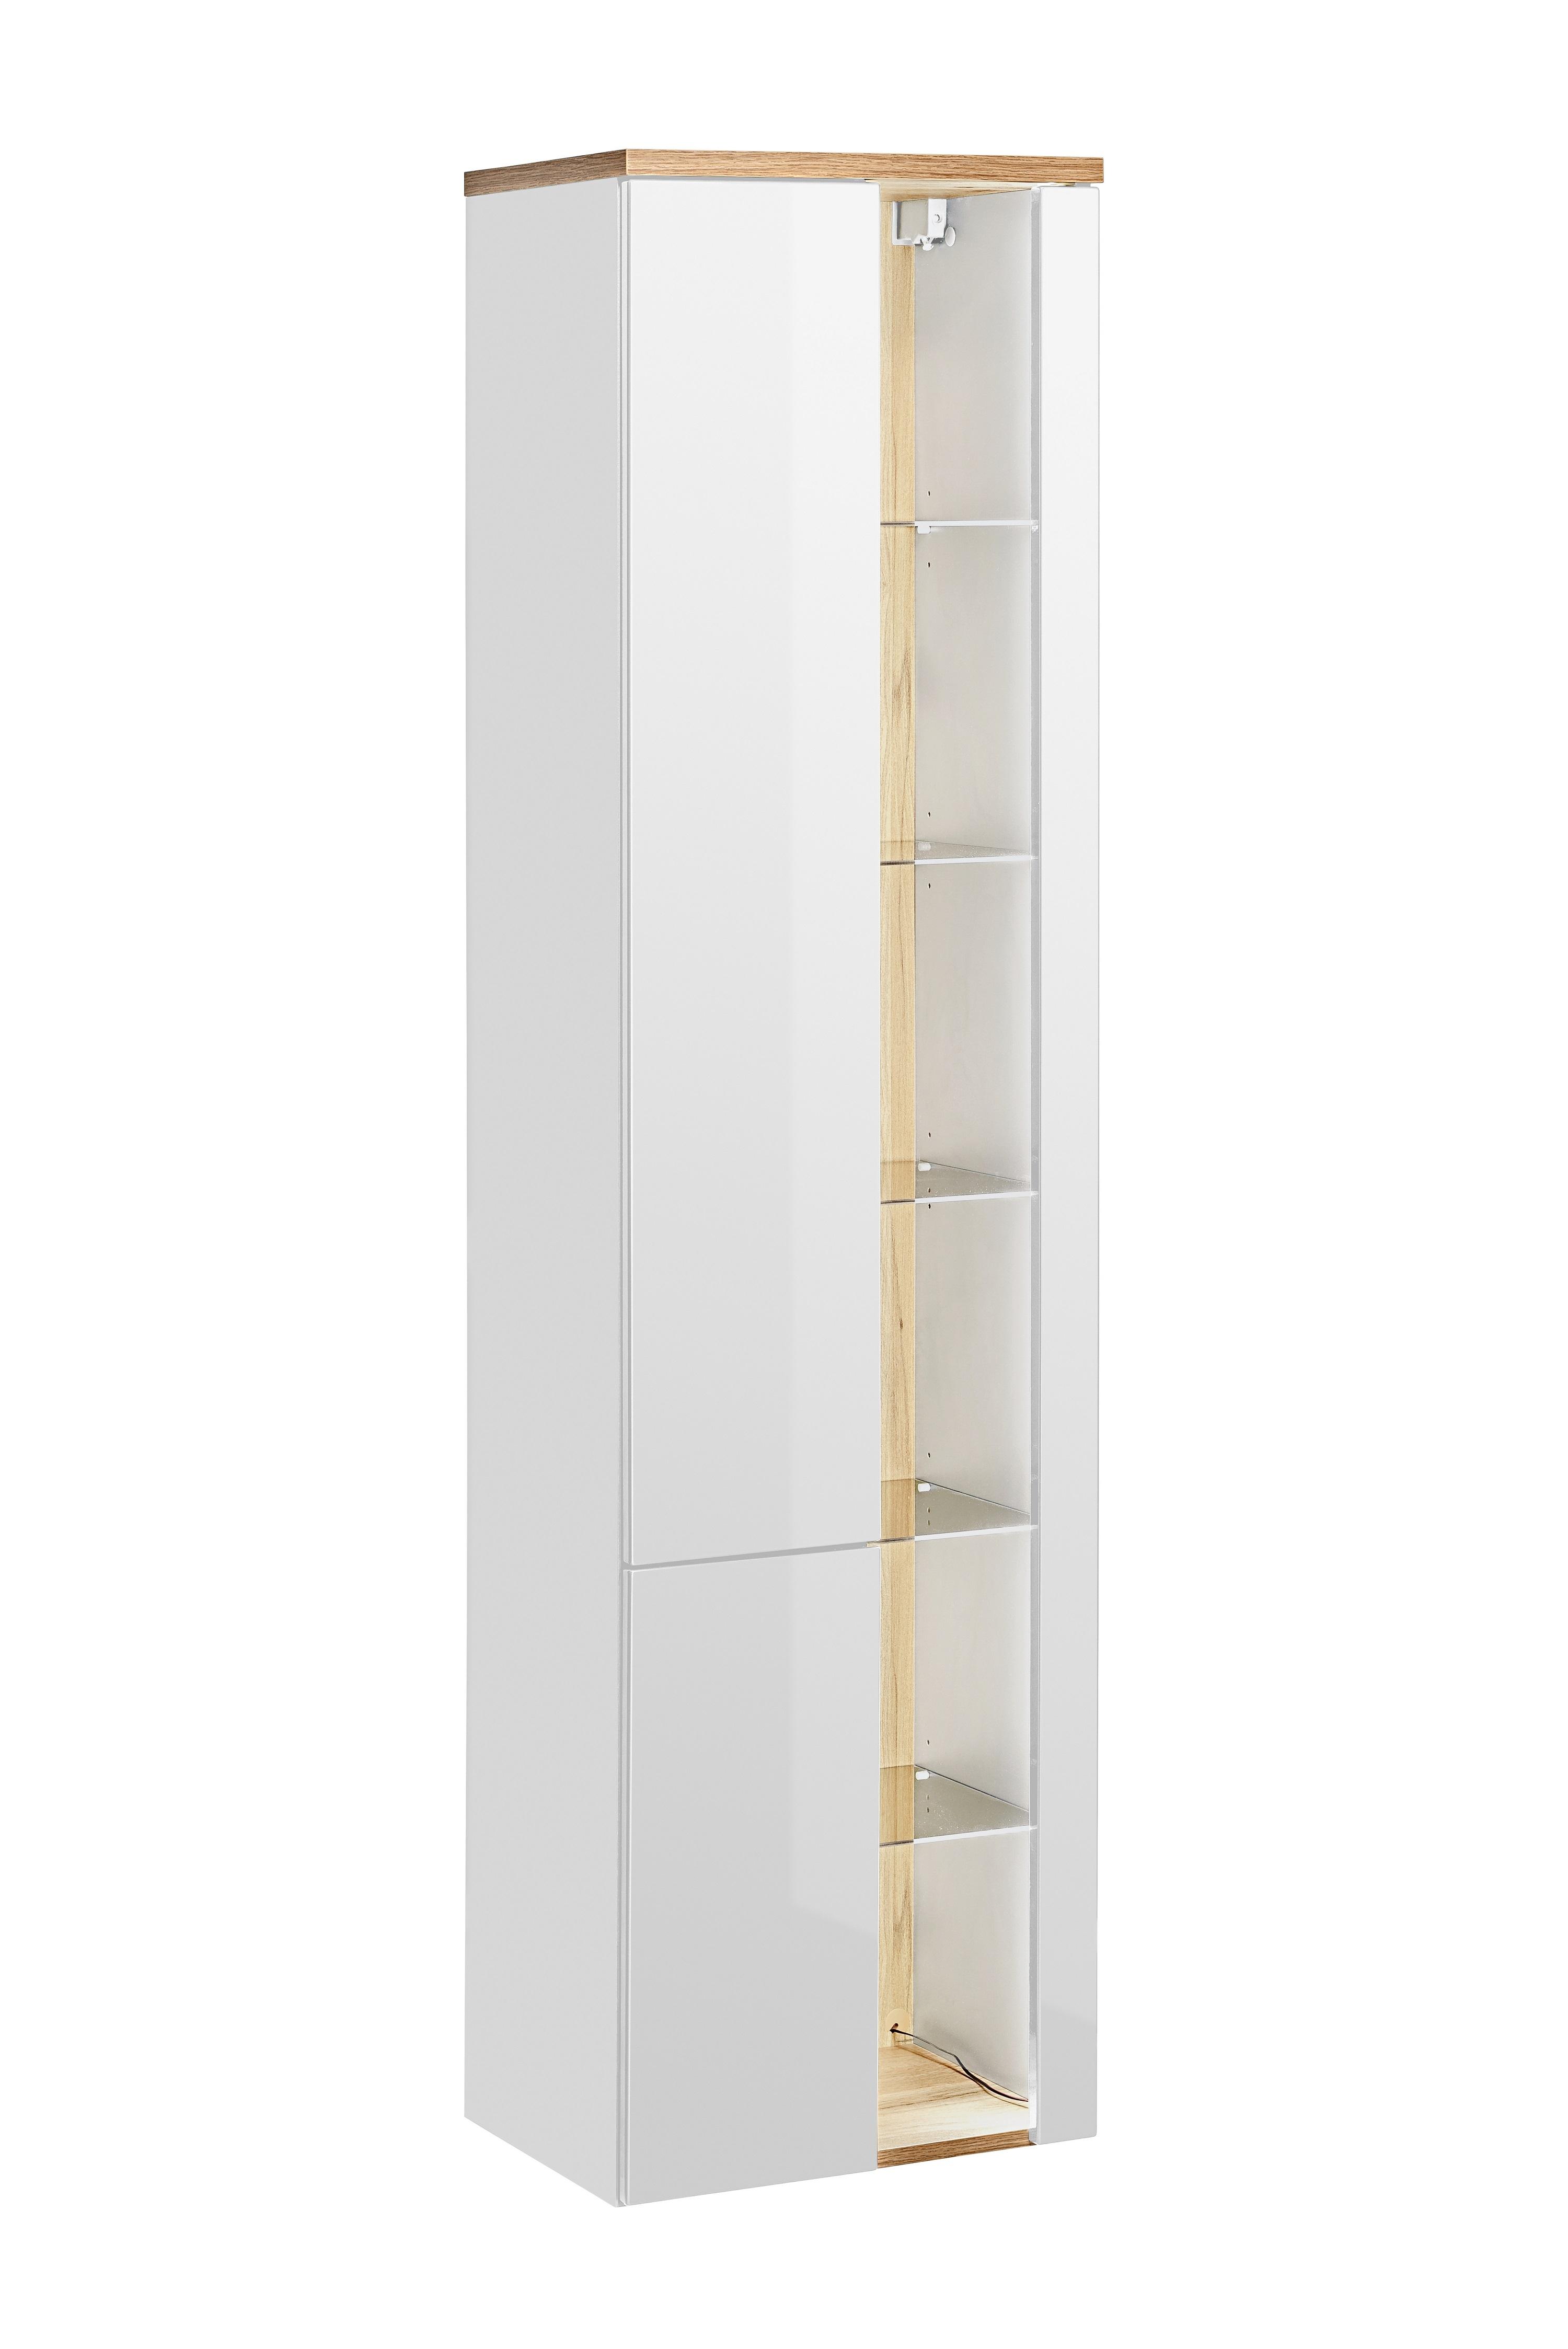 Dulap baie inalt cu rafturi si 2 usi, Bahama White, l45xA33xH170 cm